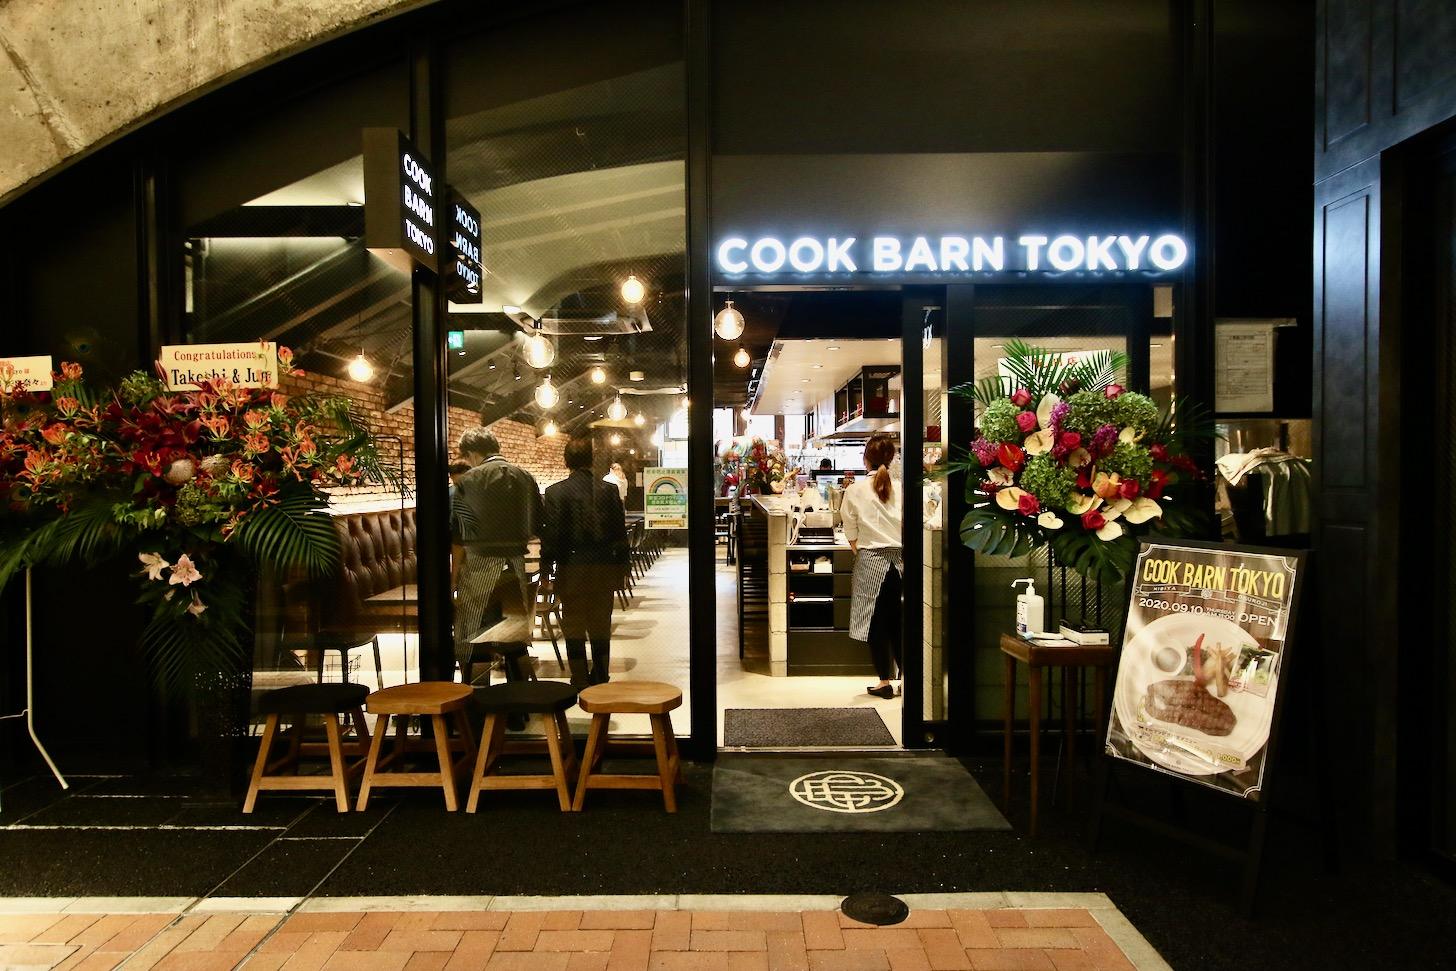 COOK BARN TOKYO